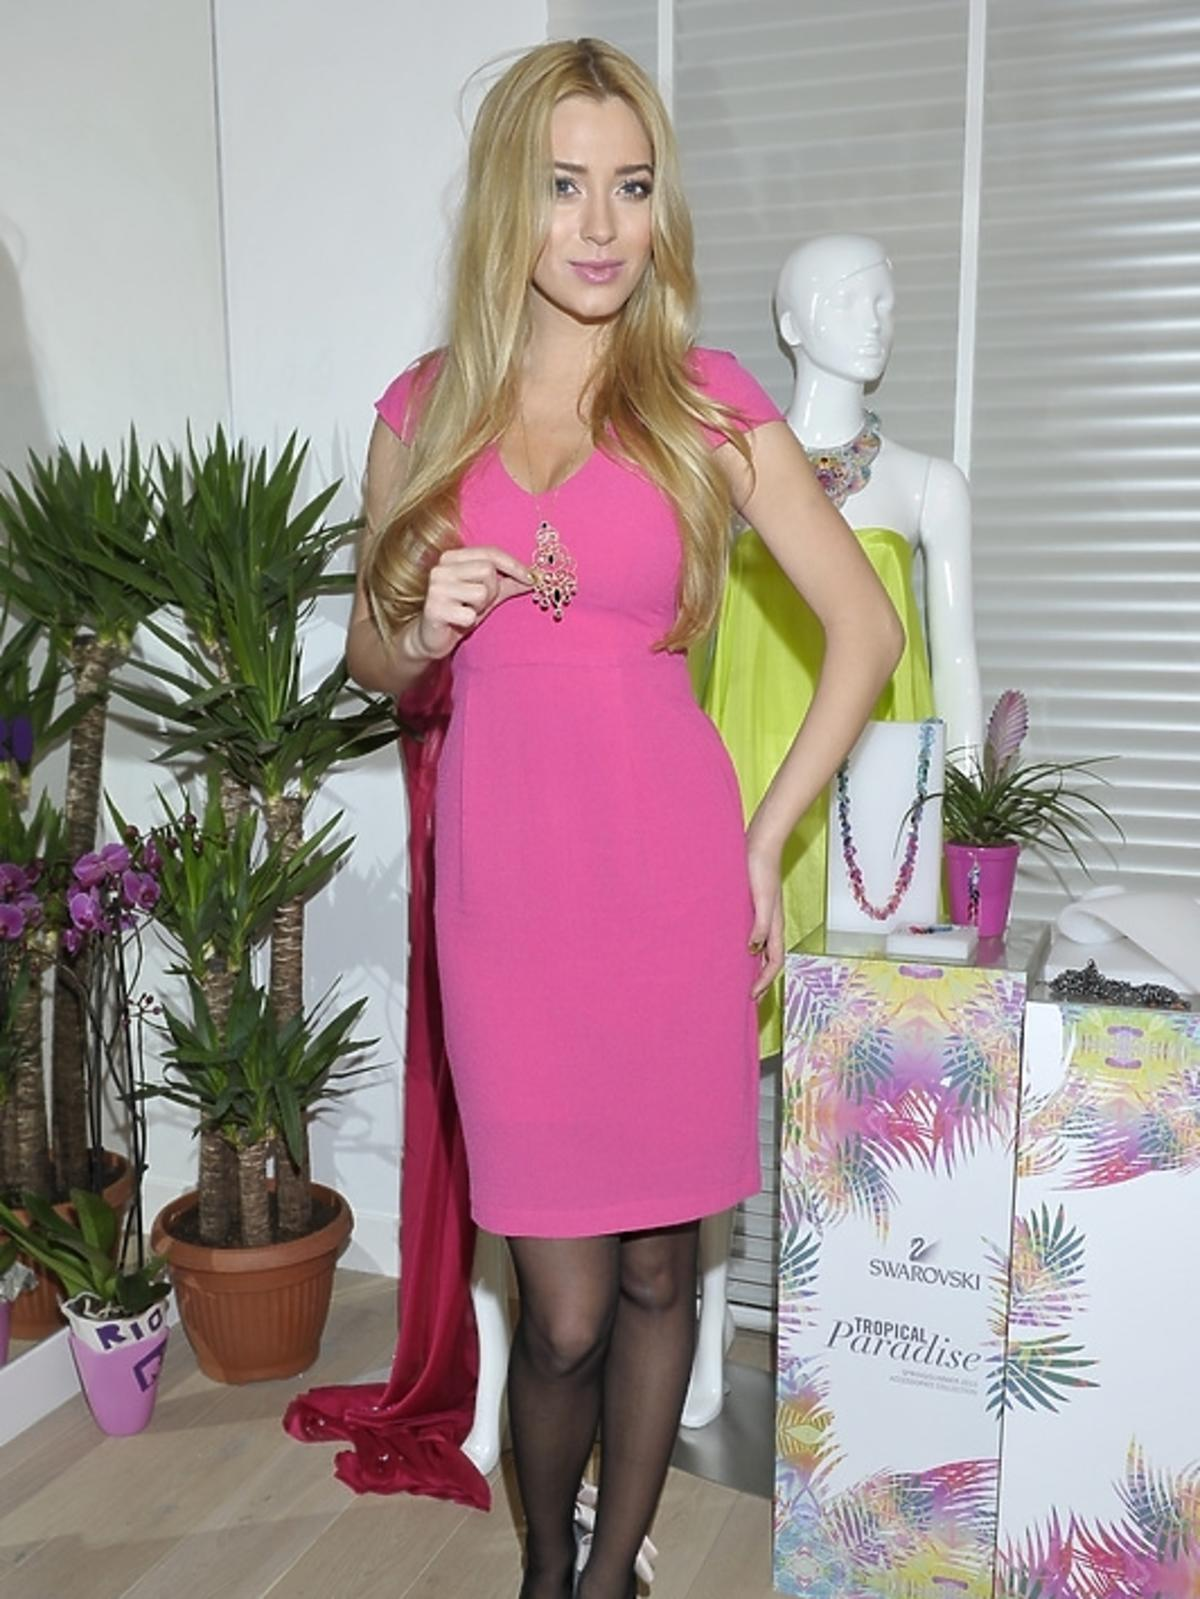 Marcelina Zawadzka na pokazie kolekcji Swarovski - lato 2013